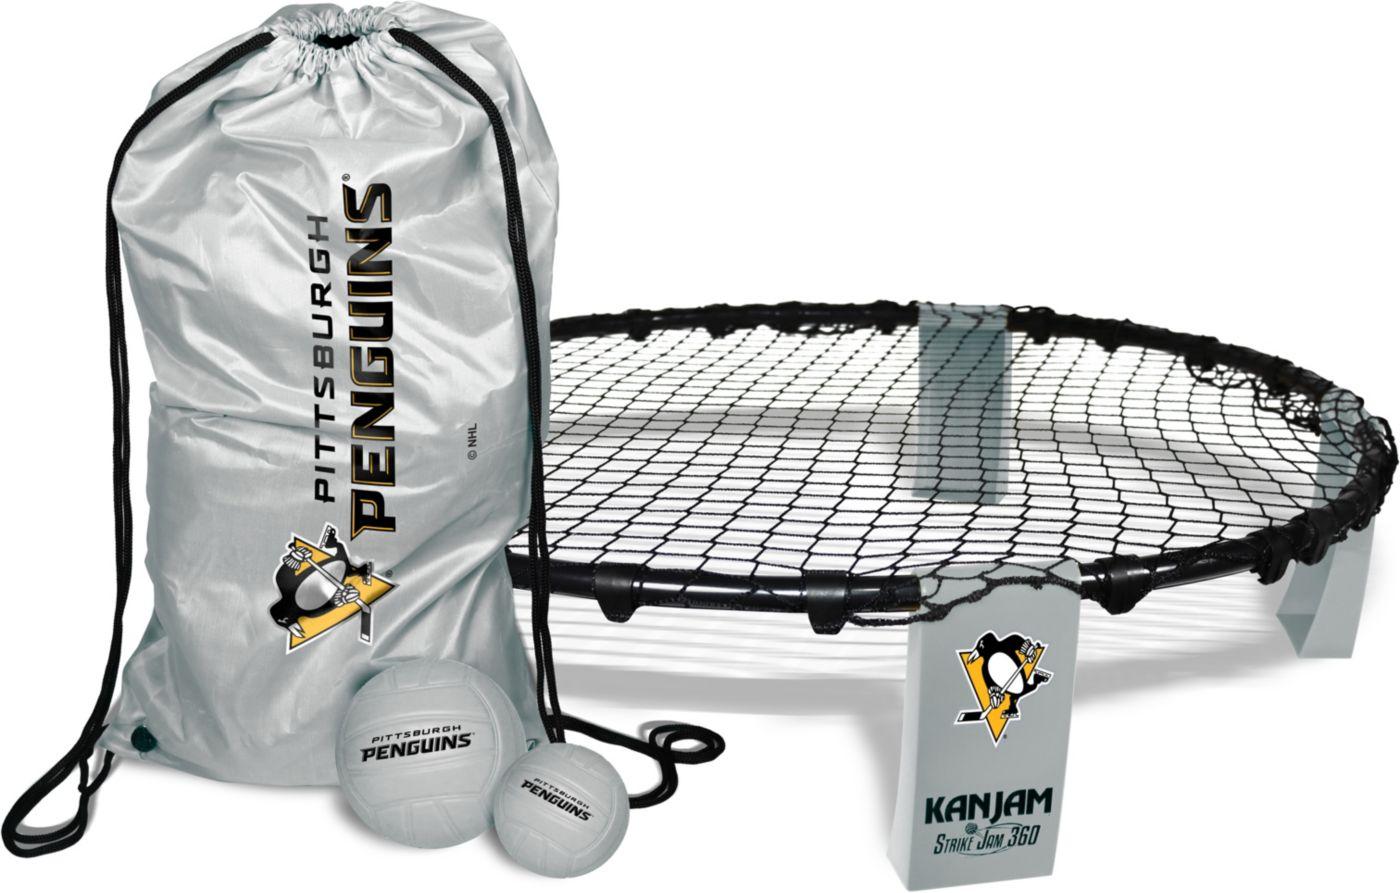 Wild Sports Pittsburgh Penguins Strike Jam Combo Game